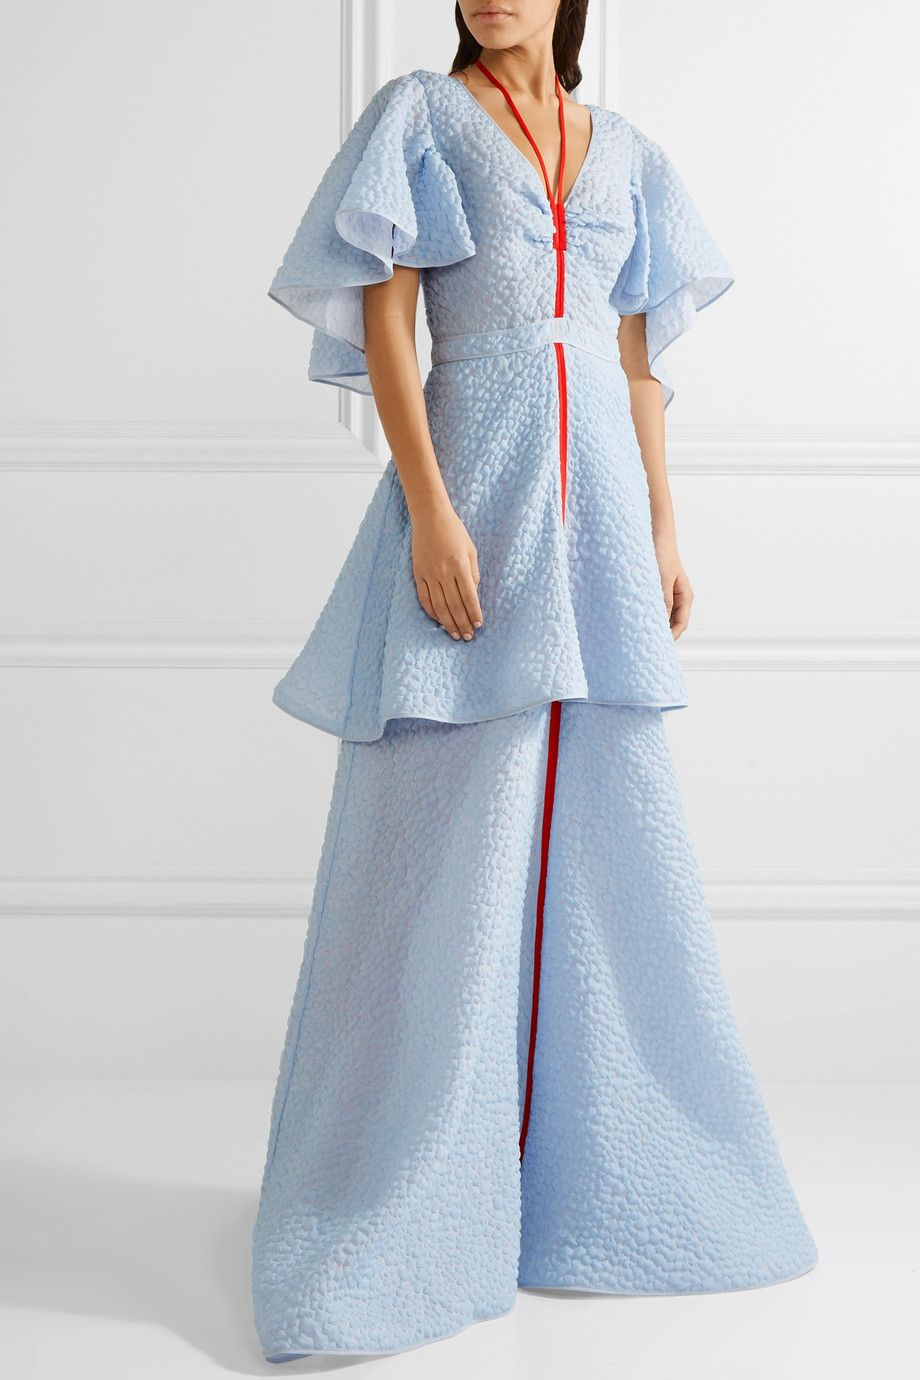 Rosie Assoulin | Tie-neck ruffled seersucker gown | NET-A-PORTER.COM